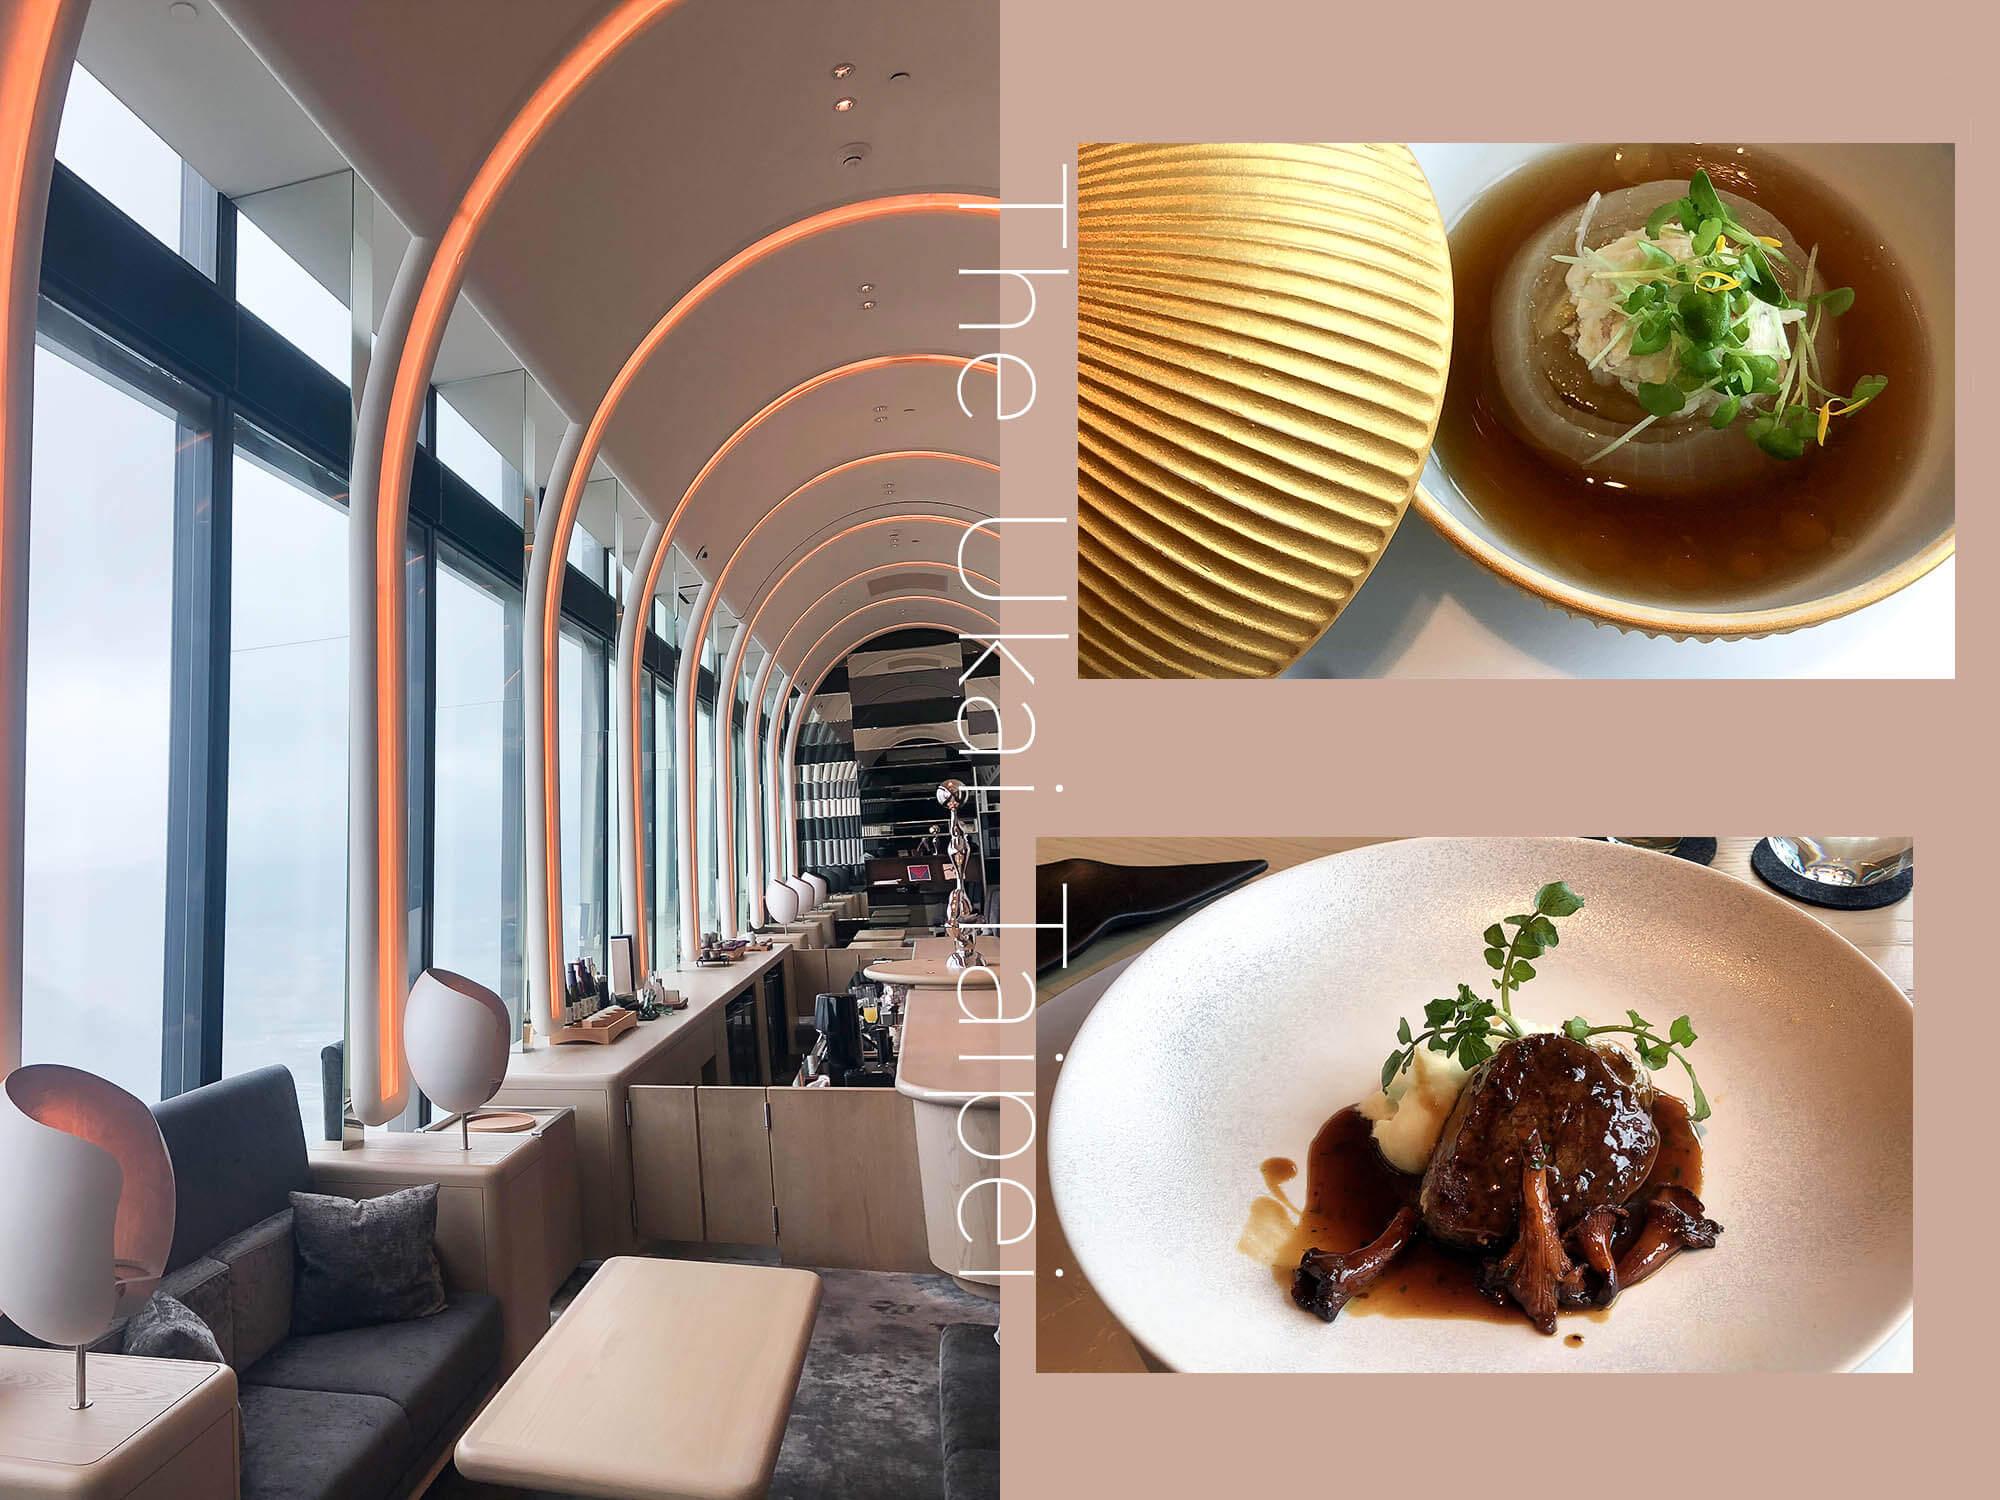 The Ukai Taipei鐵板燒&日式割烹|絕美的微風南山景觀餐廳,超水準的餐點和日式職人態度!